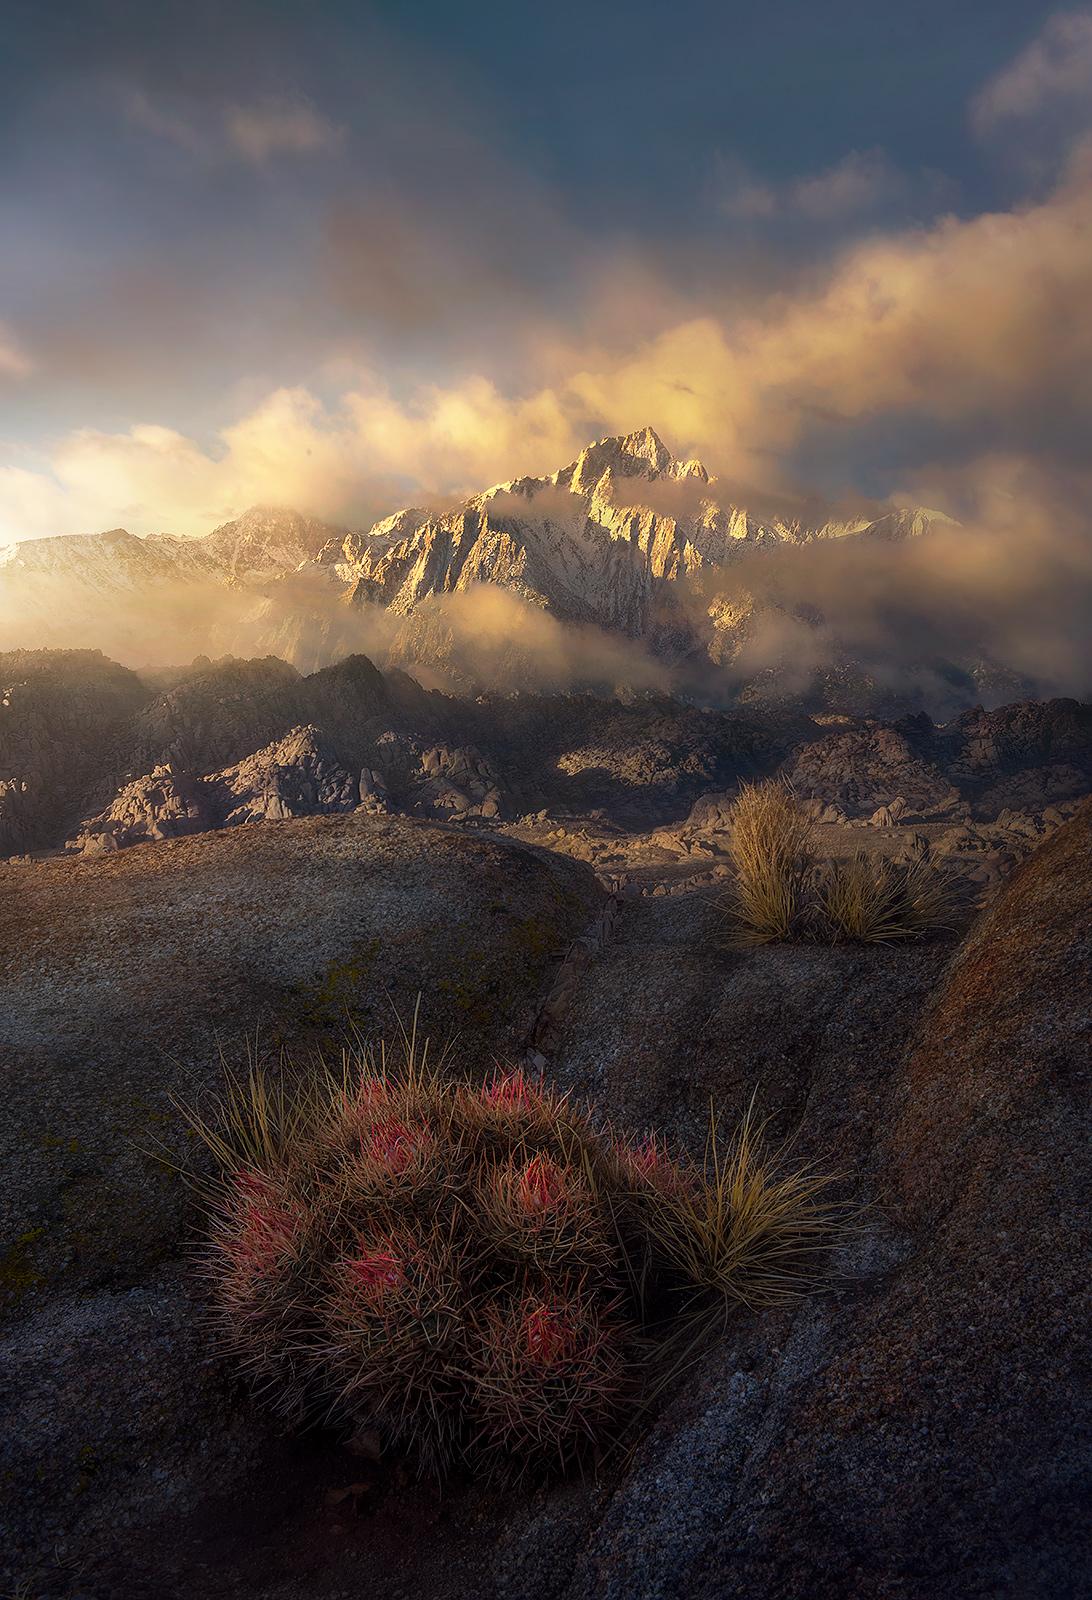 Sierra, Cactus, Snow, Clearing, Storm, Sunrise, Alabama, Mist, Fog, Movie Road, photo